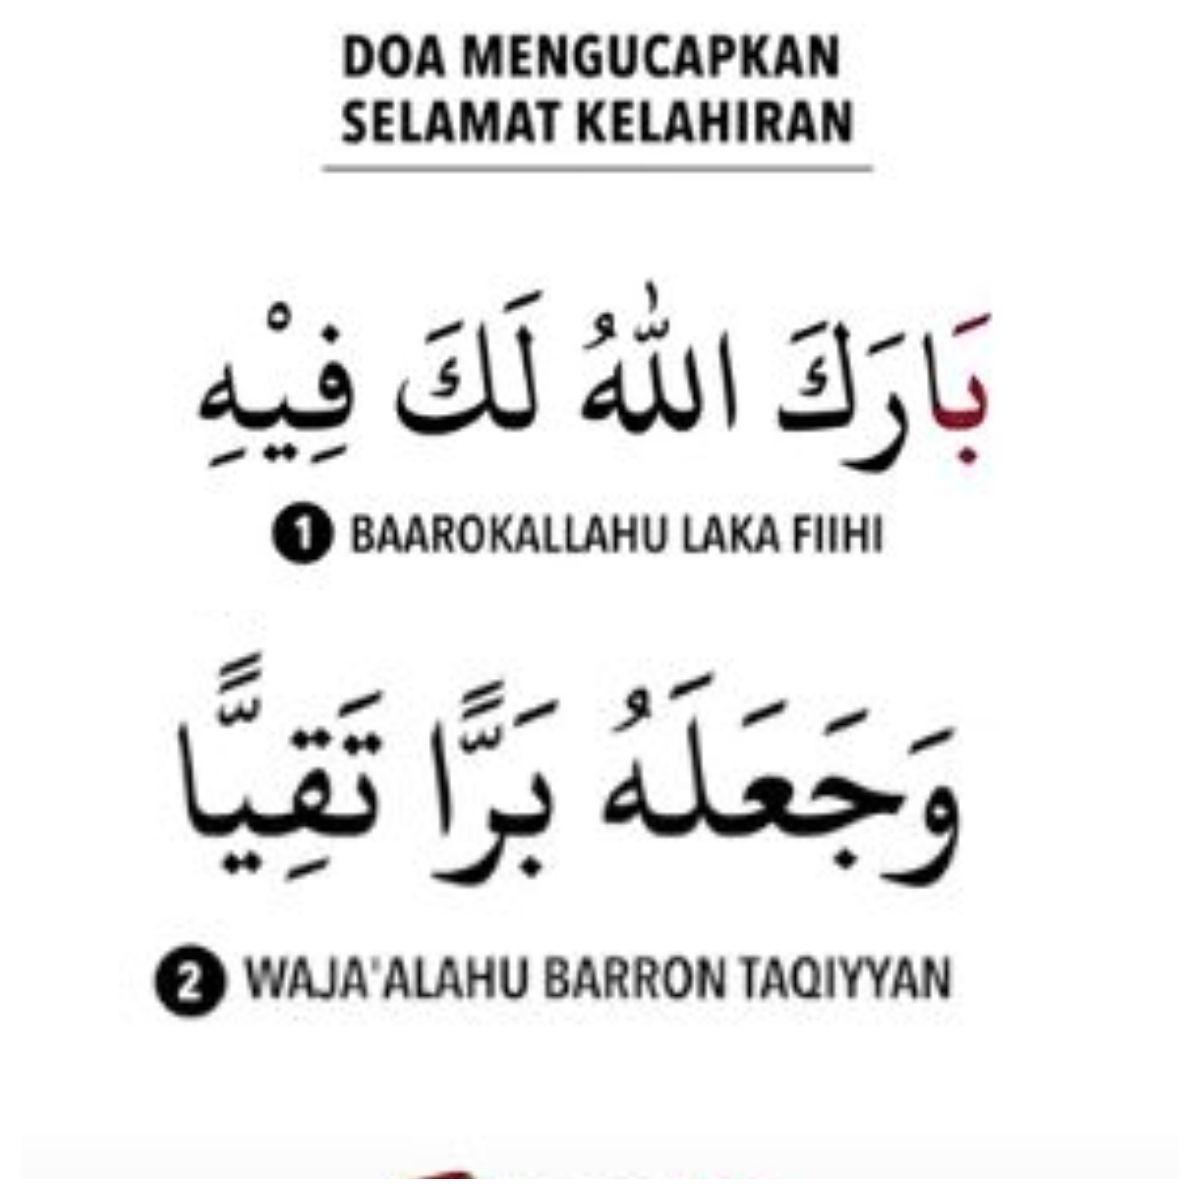 Ingin Berikan Ucapan Pada Saudara Yang Habis Lahiran Ini Doa Untuk Bayi Baru Lahir Yang Dianjurkan Dalam Islam Semua Halaman Nakita